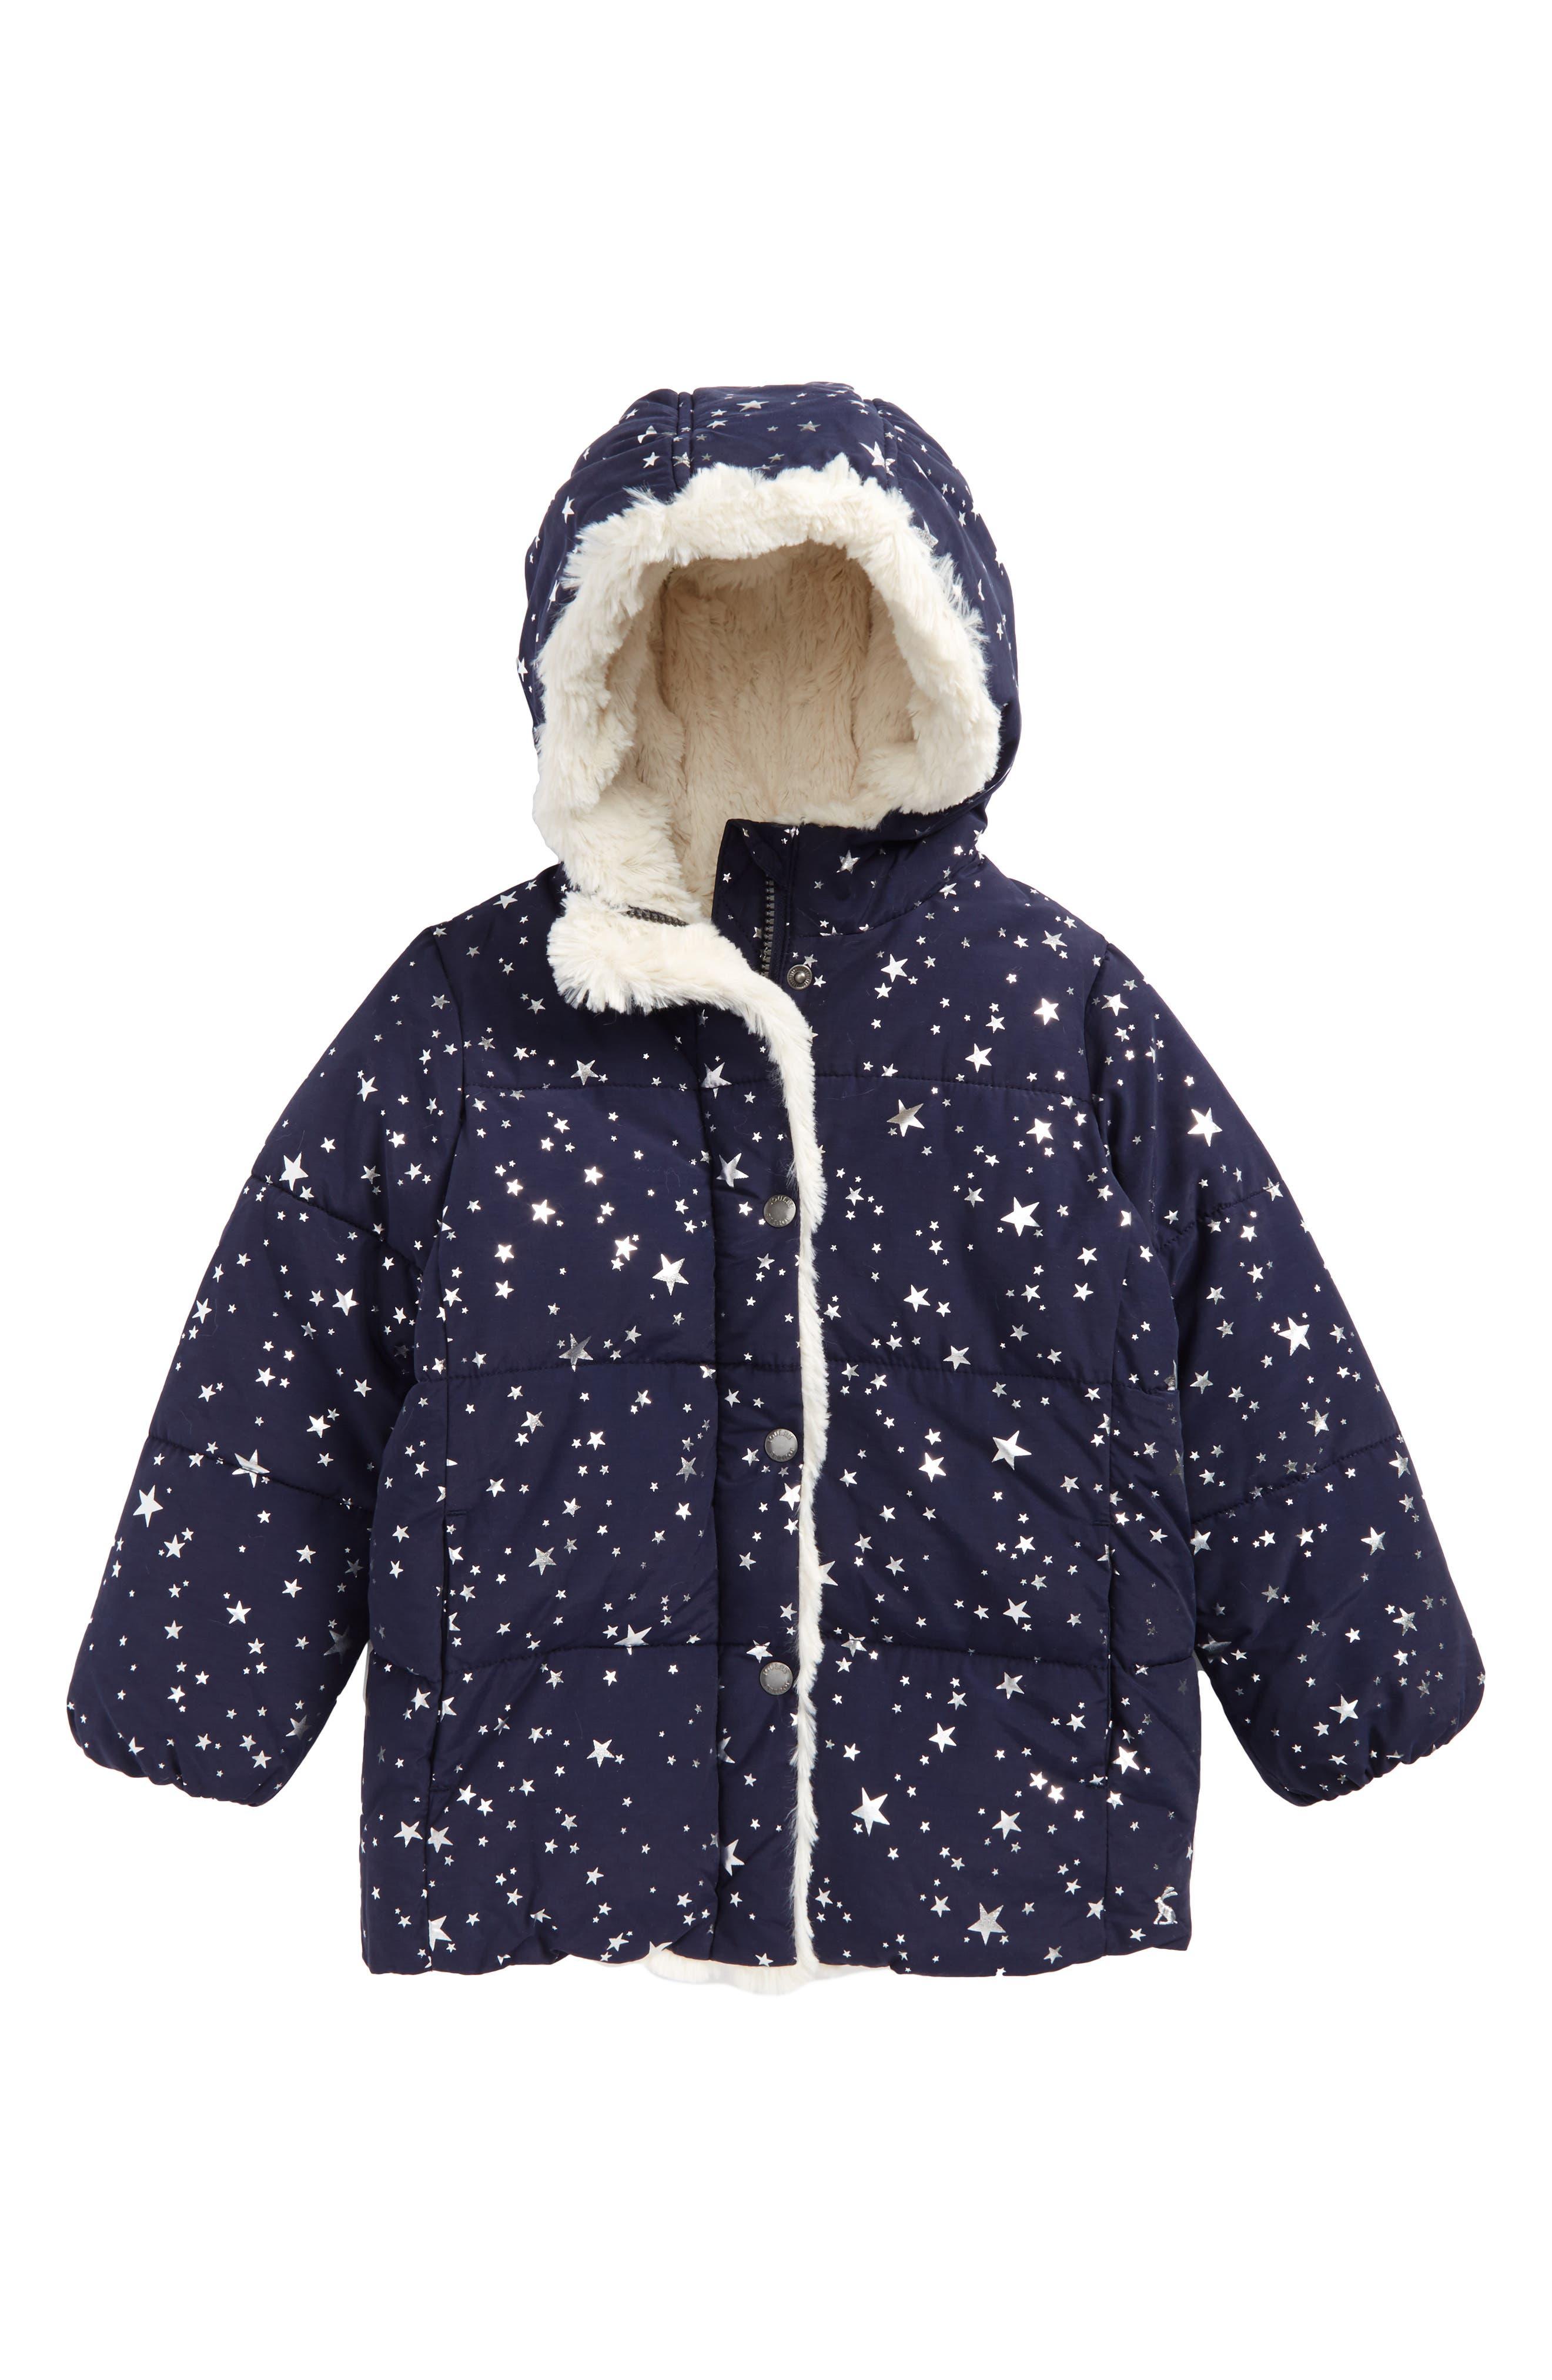 Main Image - Joules Faux Fur Trim Hooded Puffer Jacket (Toddler Girls & Little Girls)